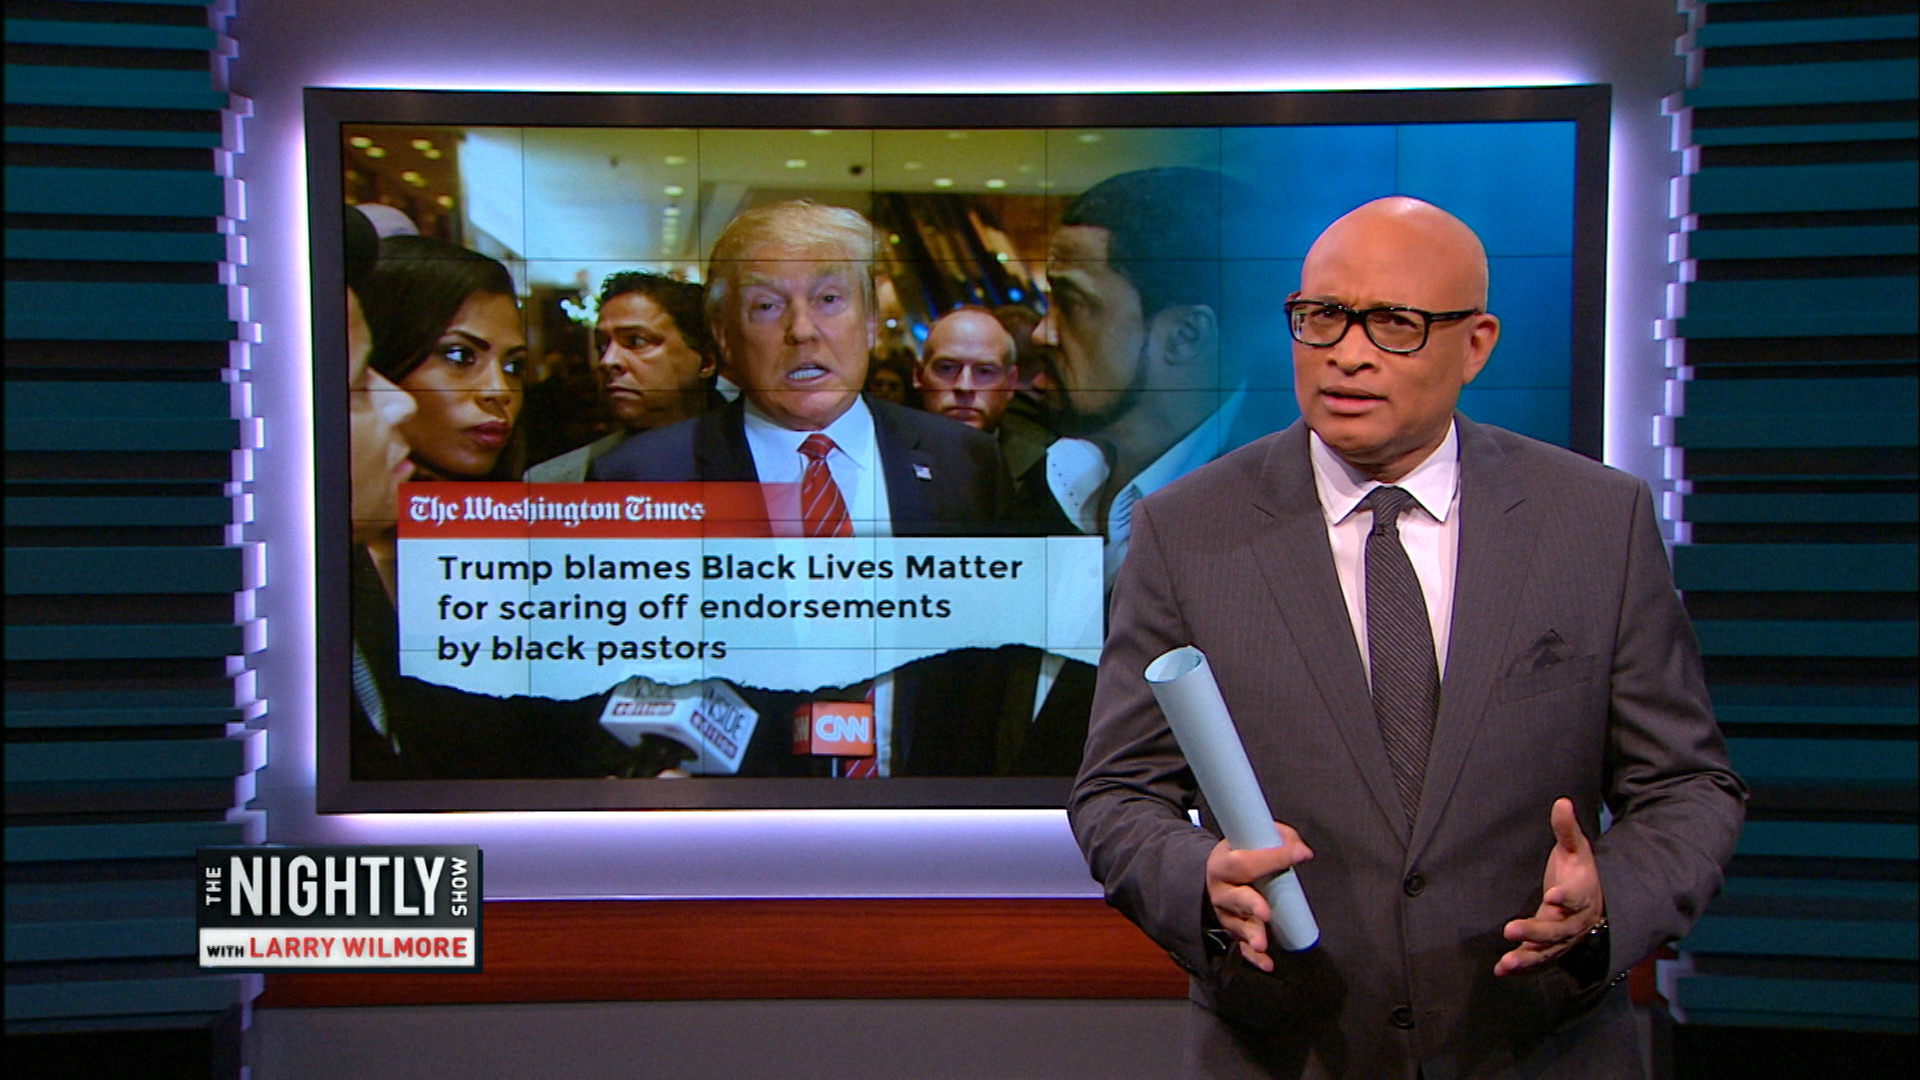 December 1, 2015 - Texas Textbook Controversy & Donald Trump